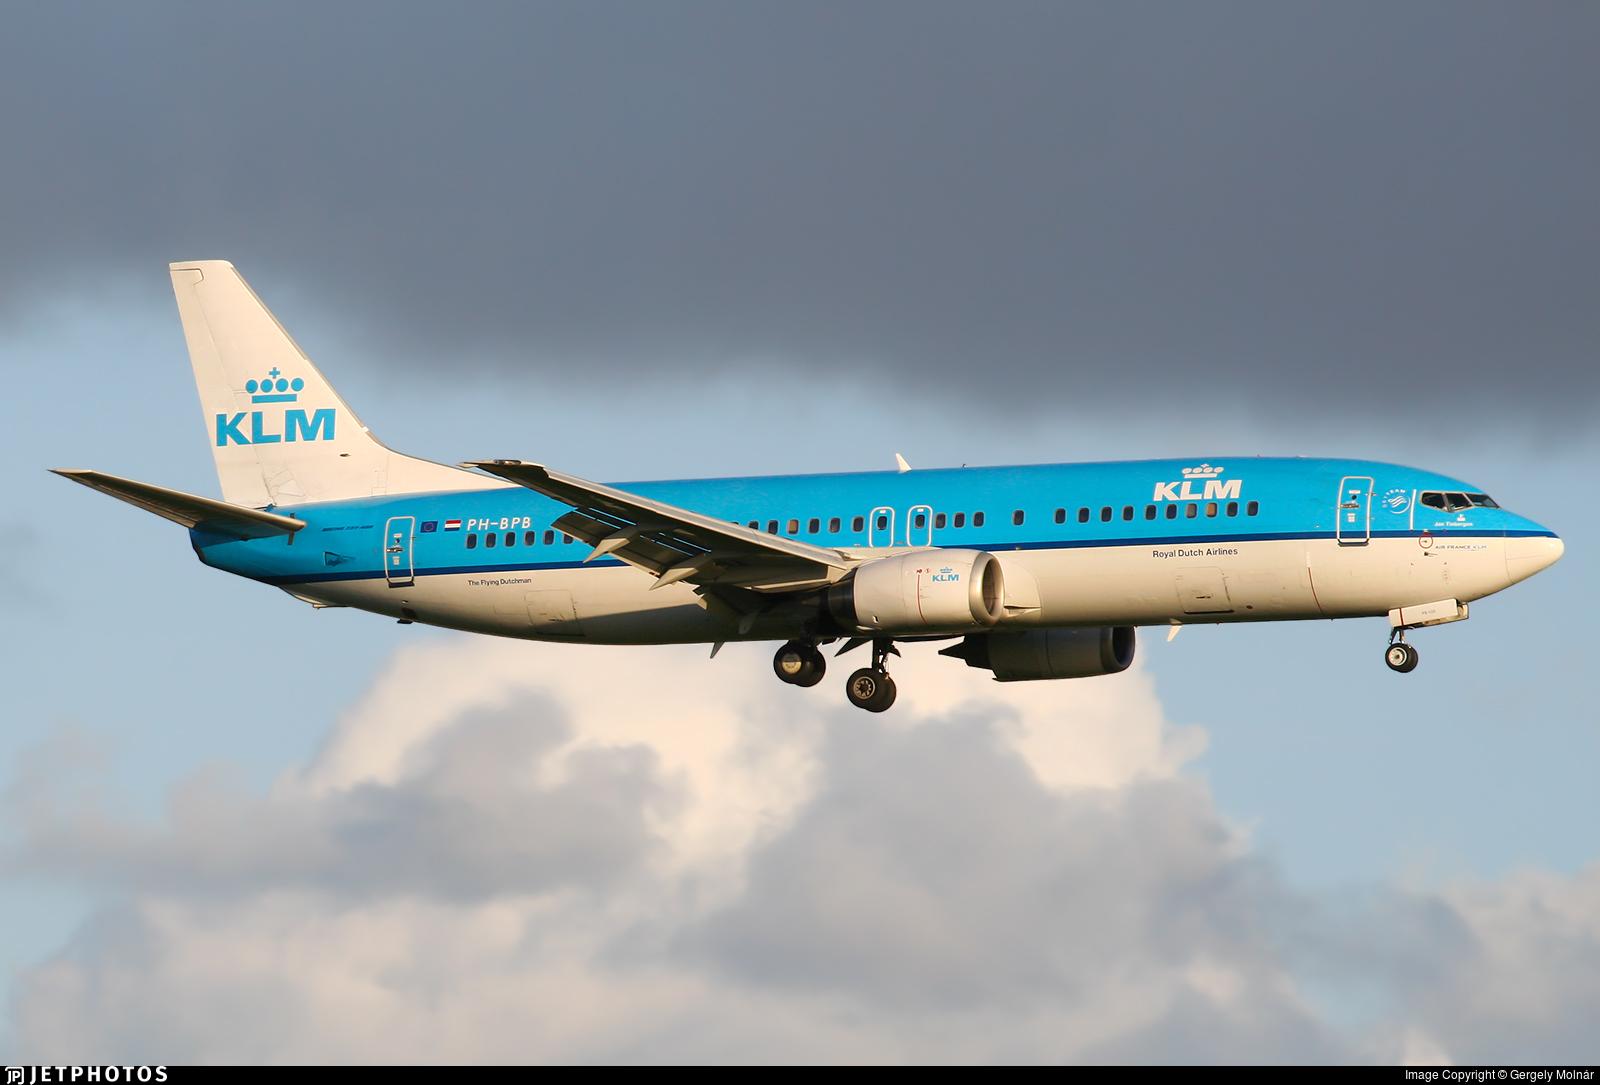 PH-BPB - Boeing 737-4Y0 - KLM Royal Dutch Airlines